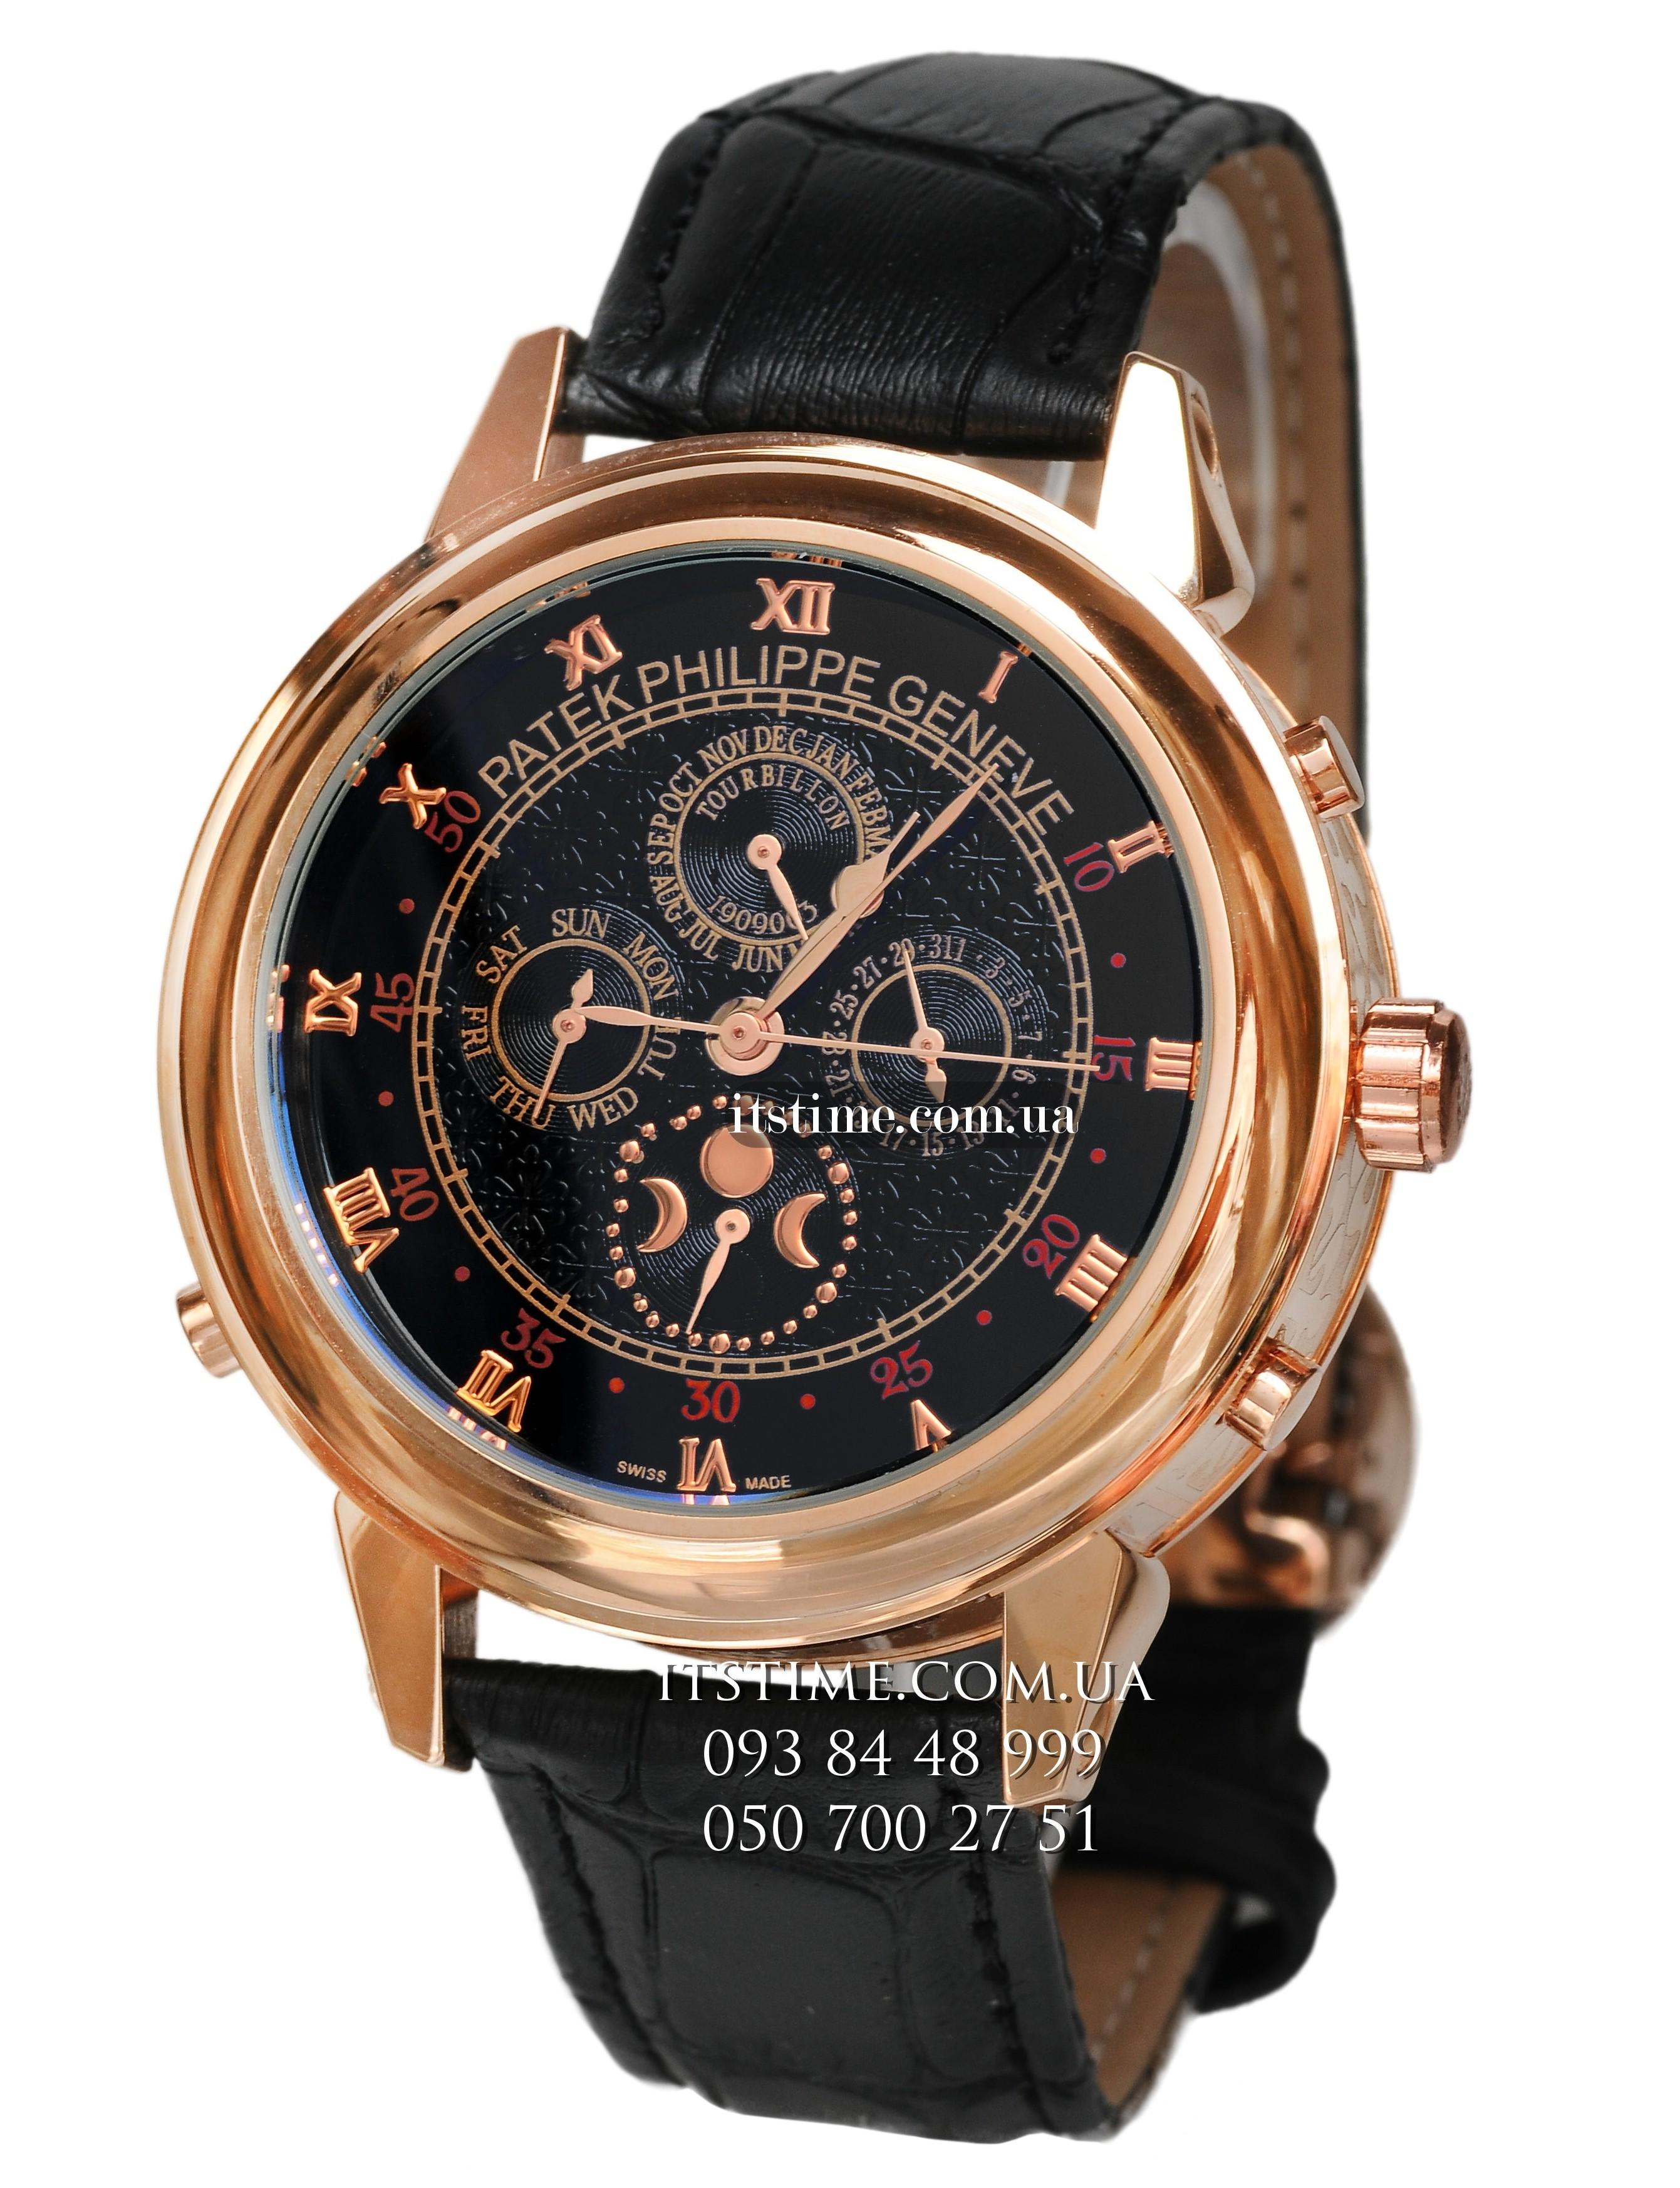 Купить часы Patek Philippe Sky Moon Tourbillon за 2030.00 грн в IT S ... 10d602602e5